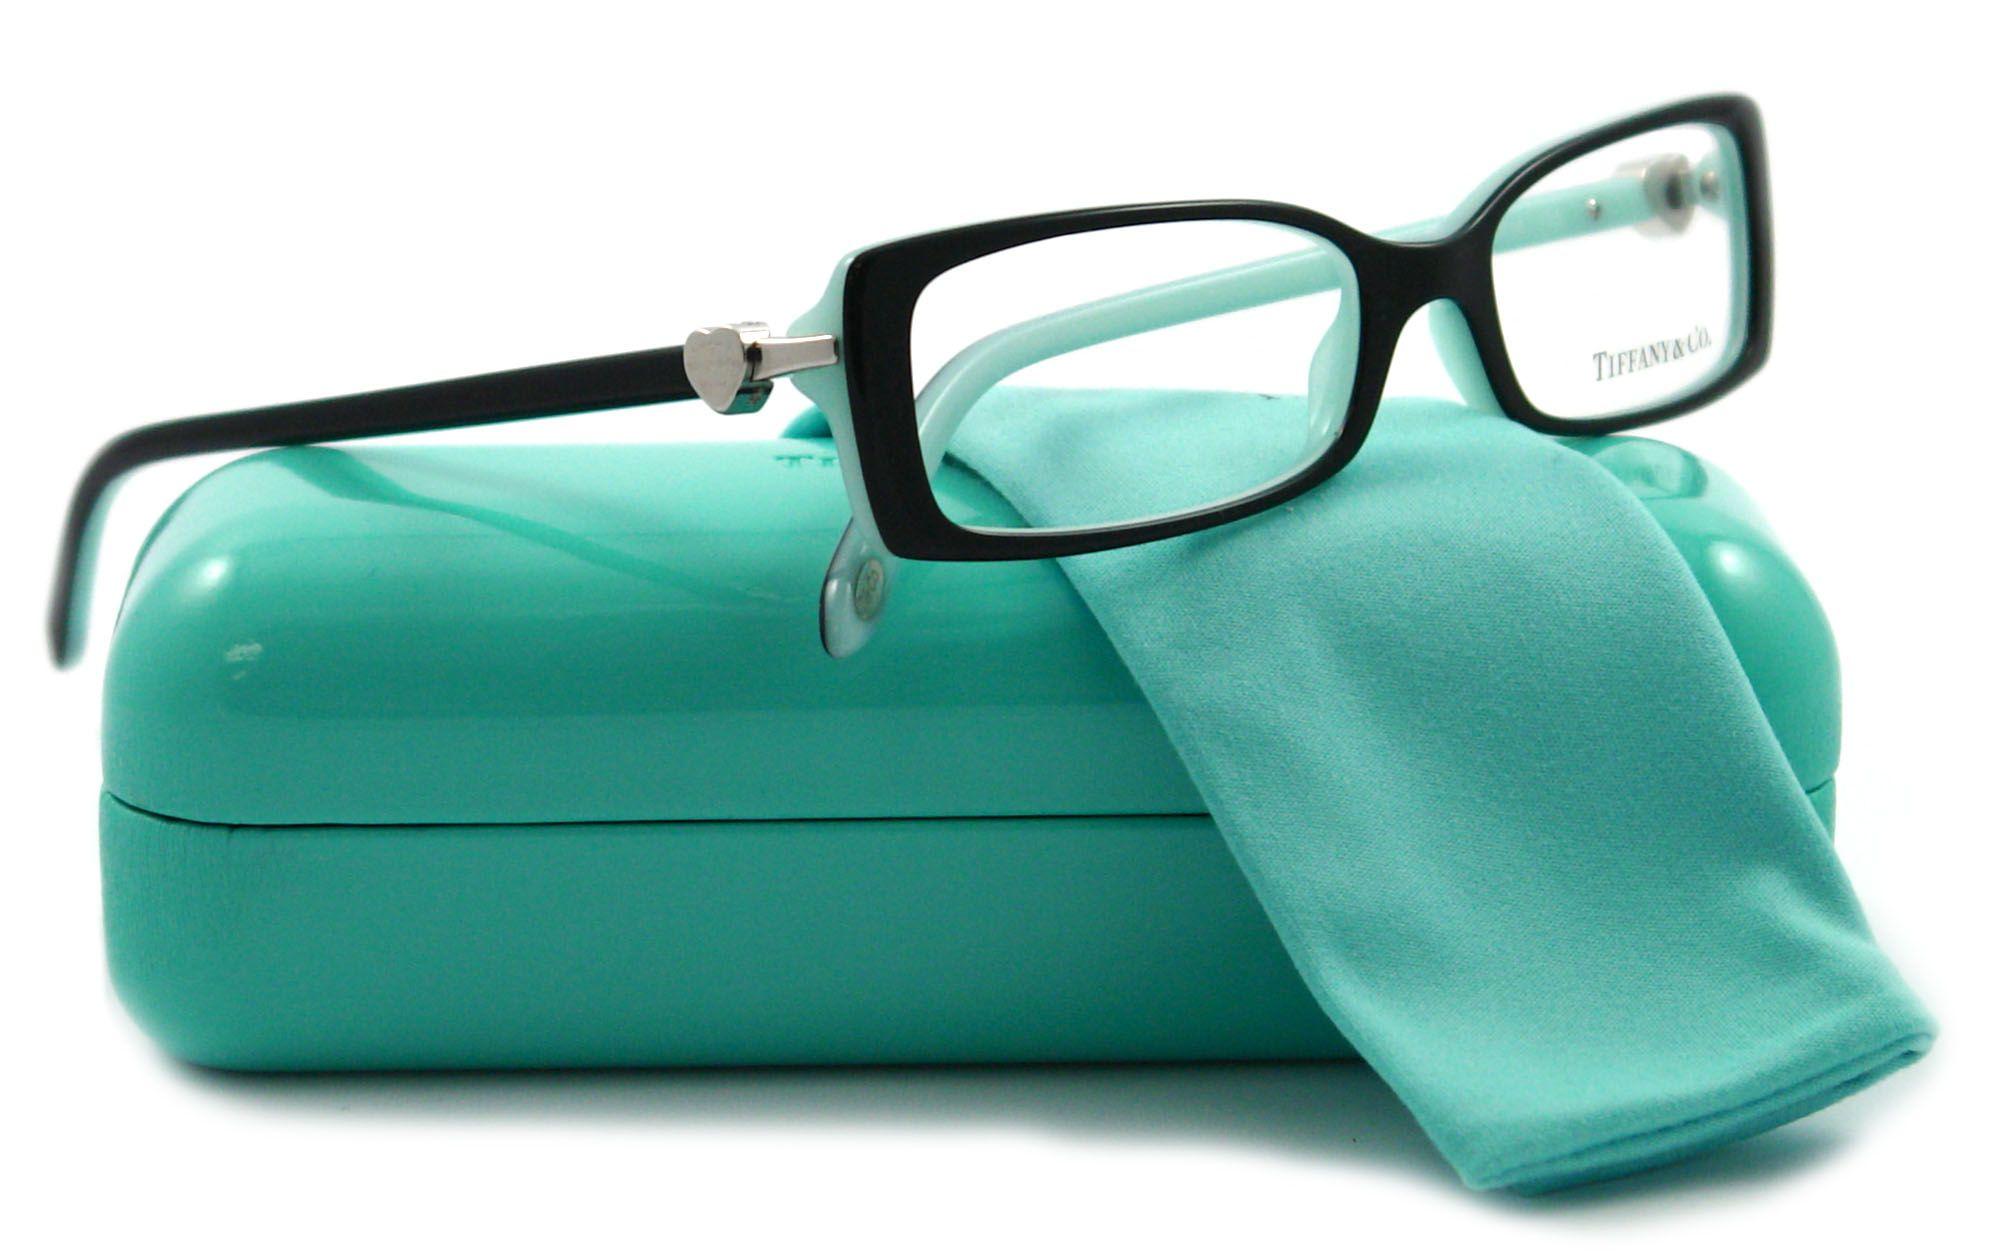 NEW Tiffany Eyeglasses TIF 2035 BLUE 8055 50MM AUTH   Tiffany